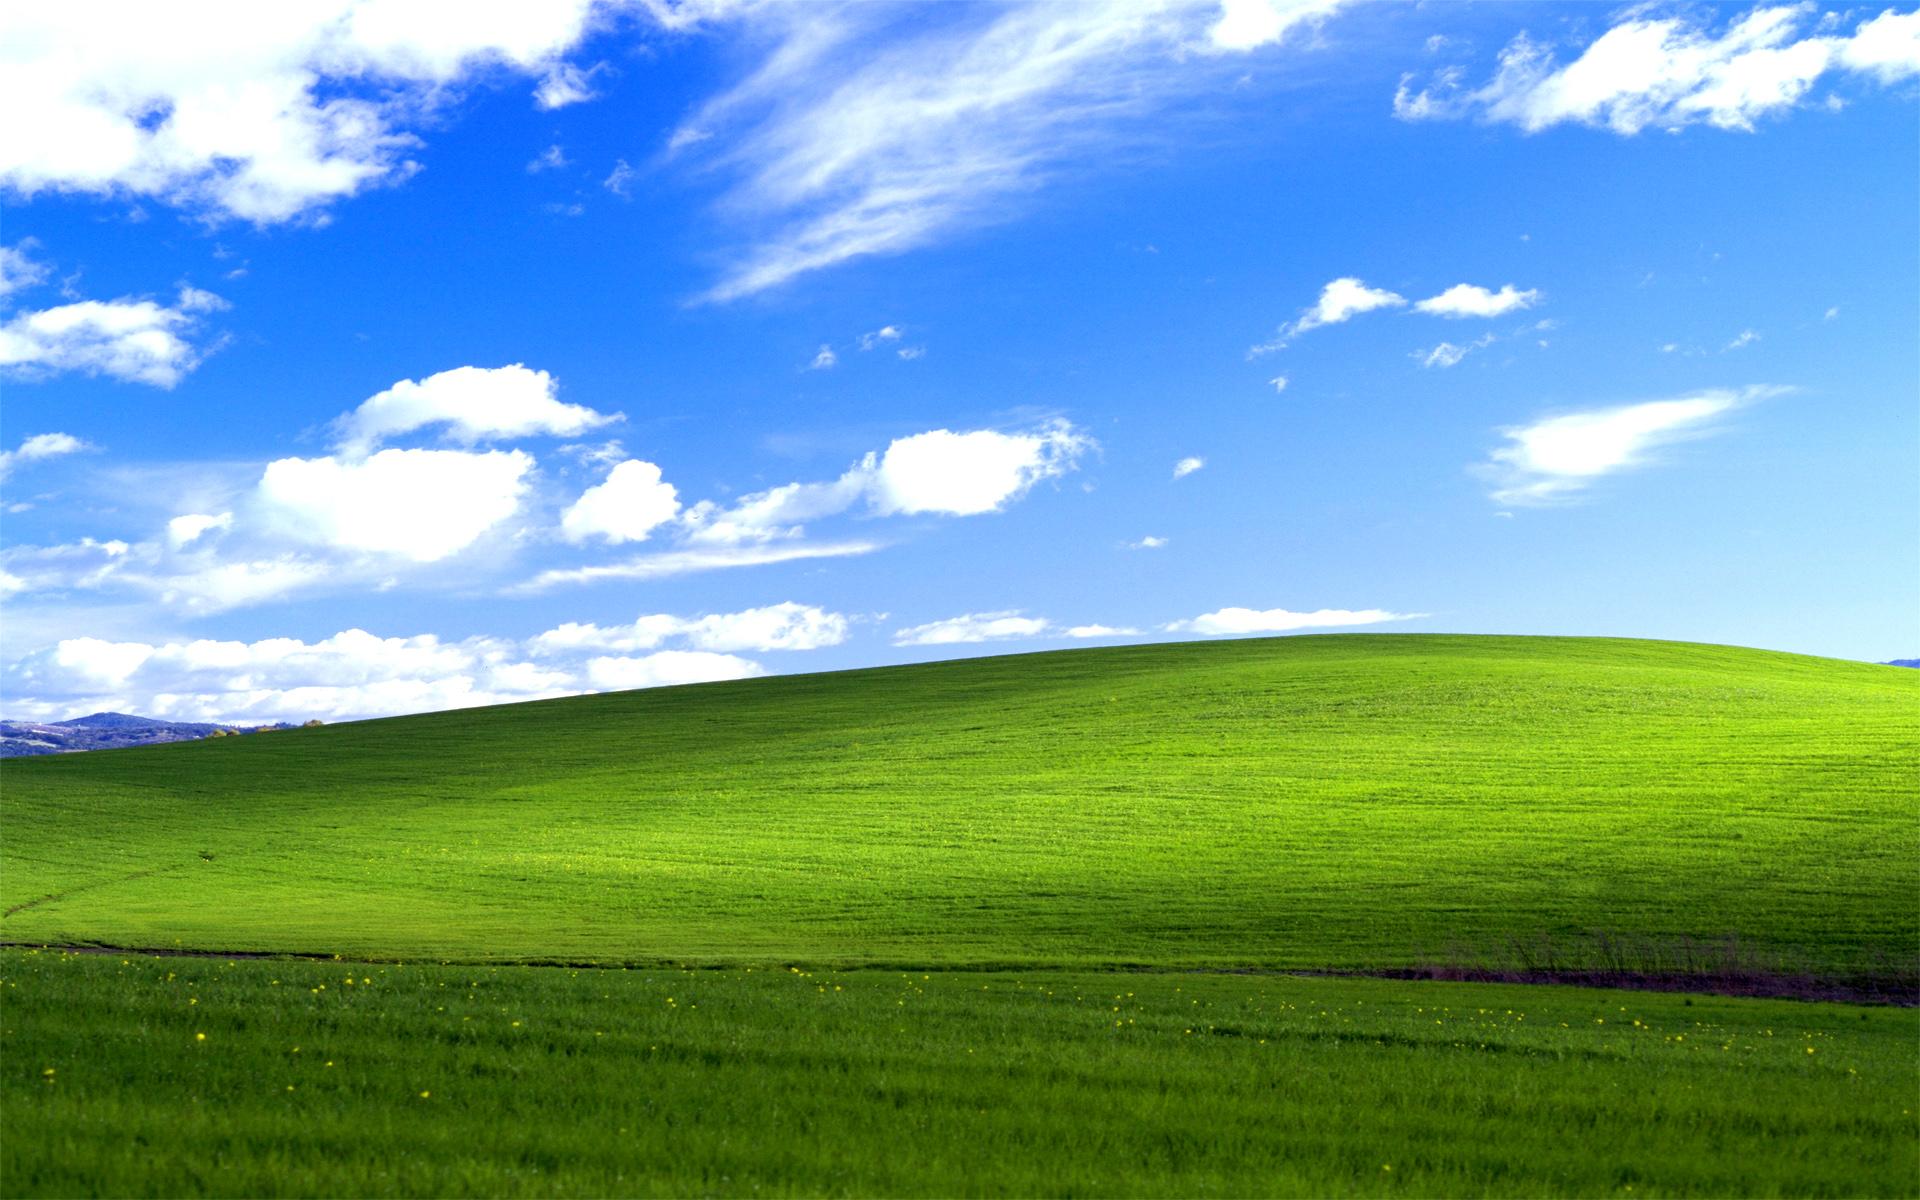 Windows Xp Professional Wallpaper 1920x1200